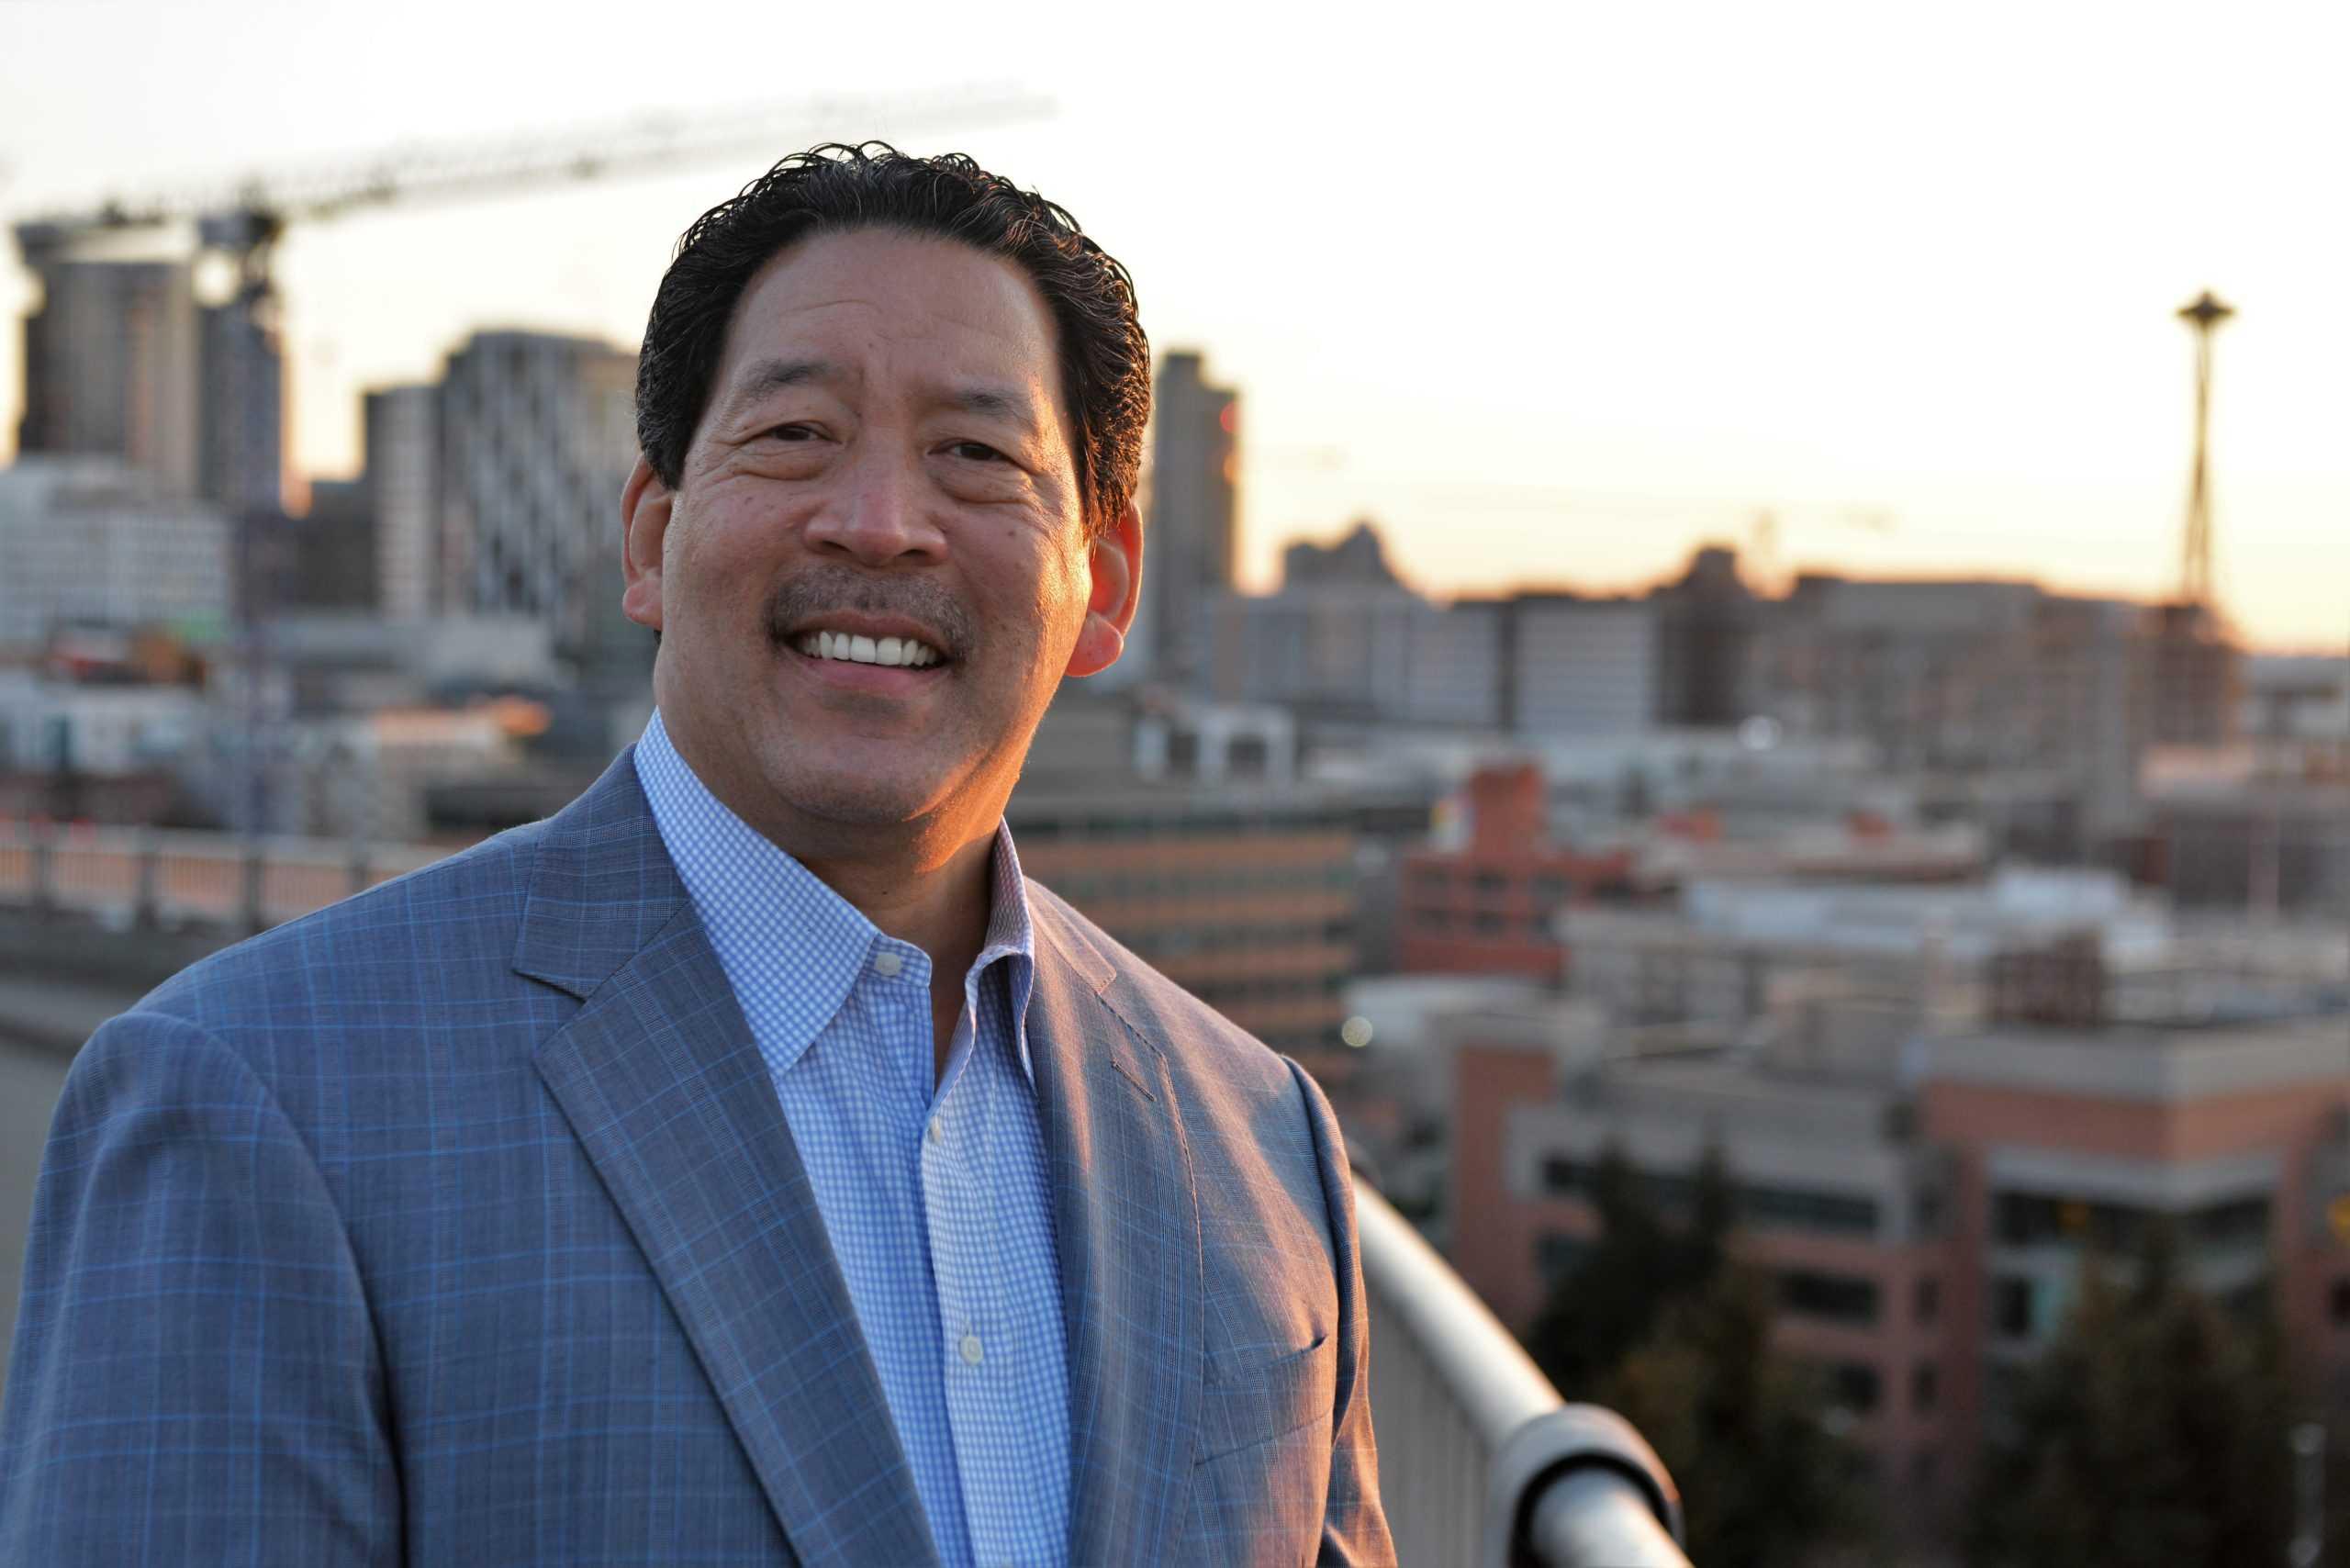 [ICYMI] Bruce Harrell Wants to Be Your Next Mayor